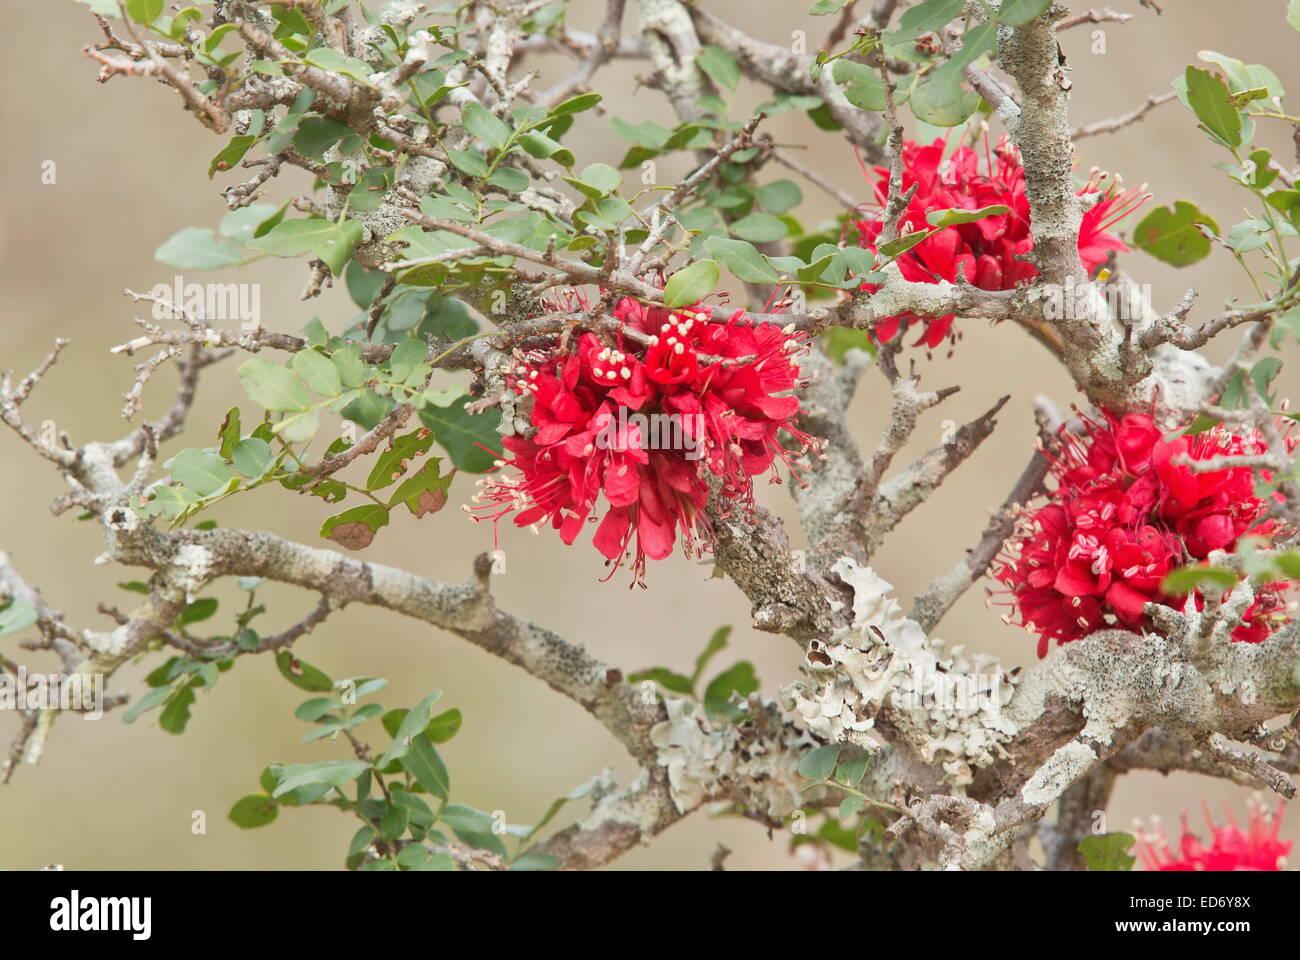 Ubriaco Parrot Tree, piangendo boerbean, Schotia brachypetala, Kruger National Park, Sud Africa Immagini Stock